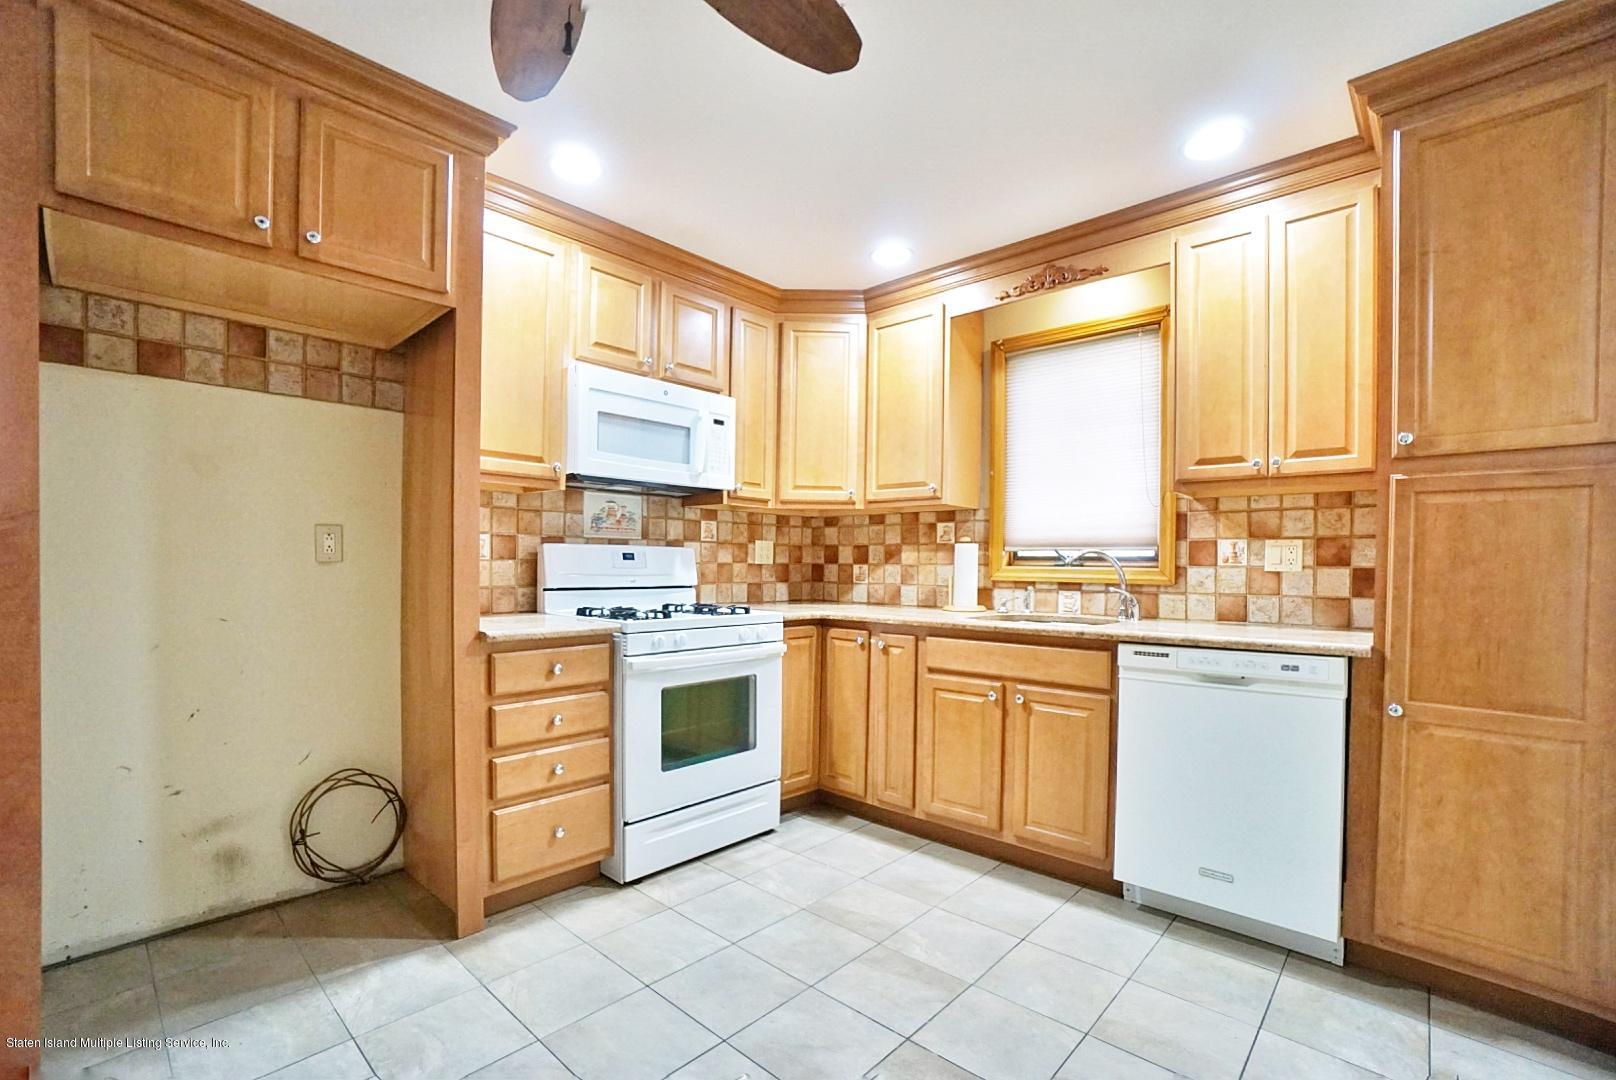 Single Family - Detached 55 Lyndale Avenue  Staten Island, NY 10312, MLS-1128769-4